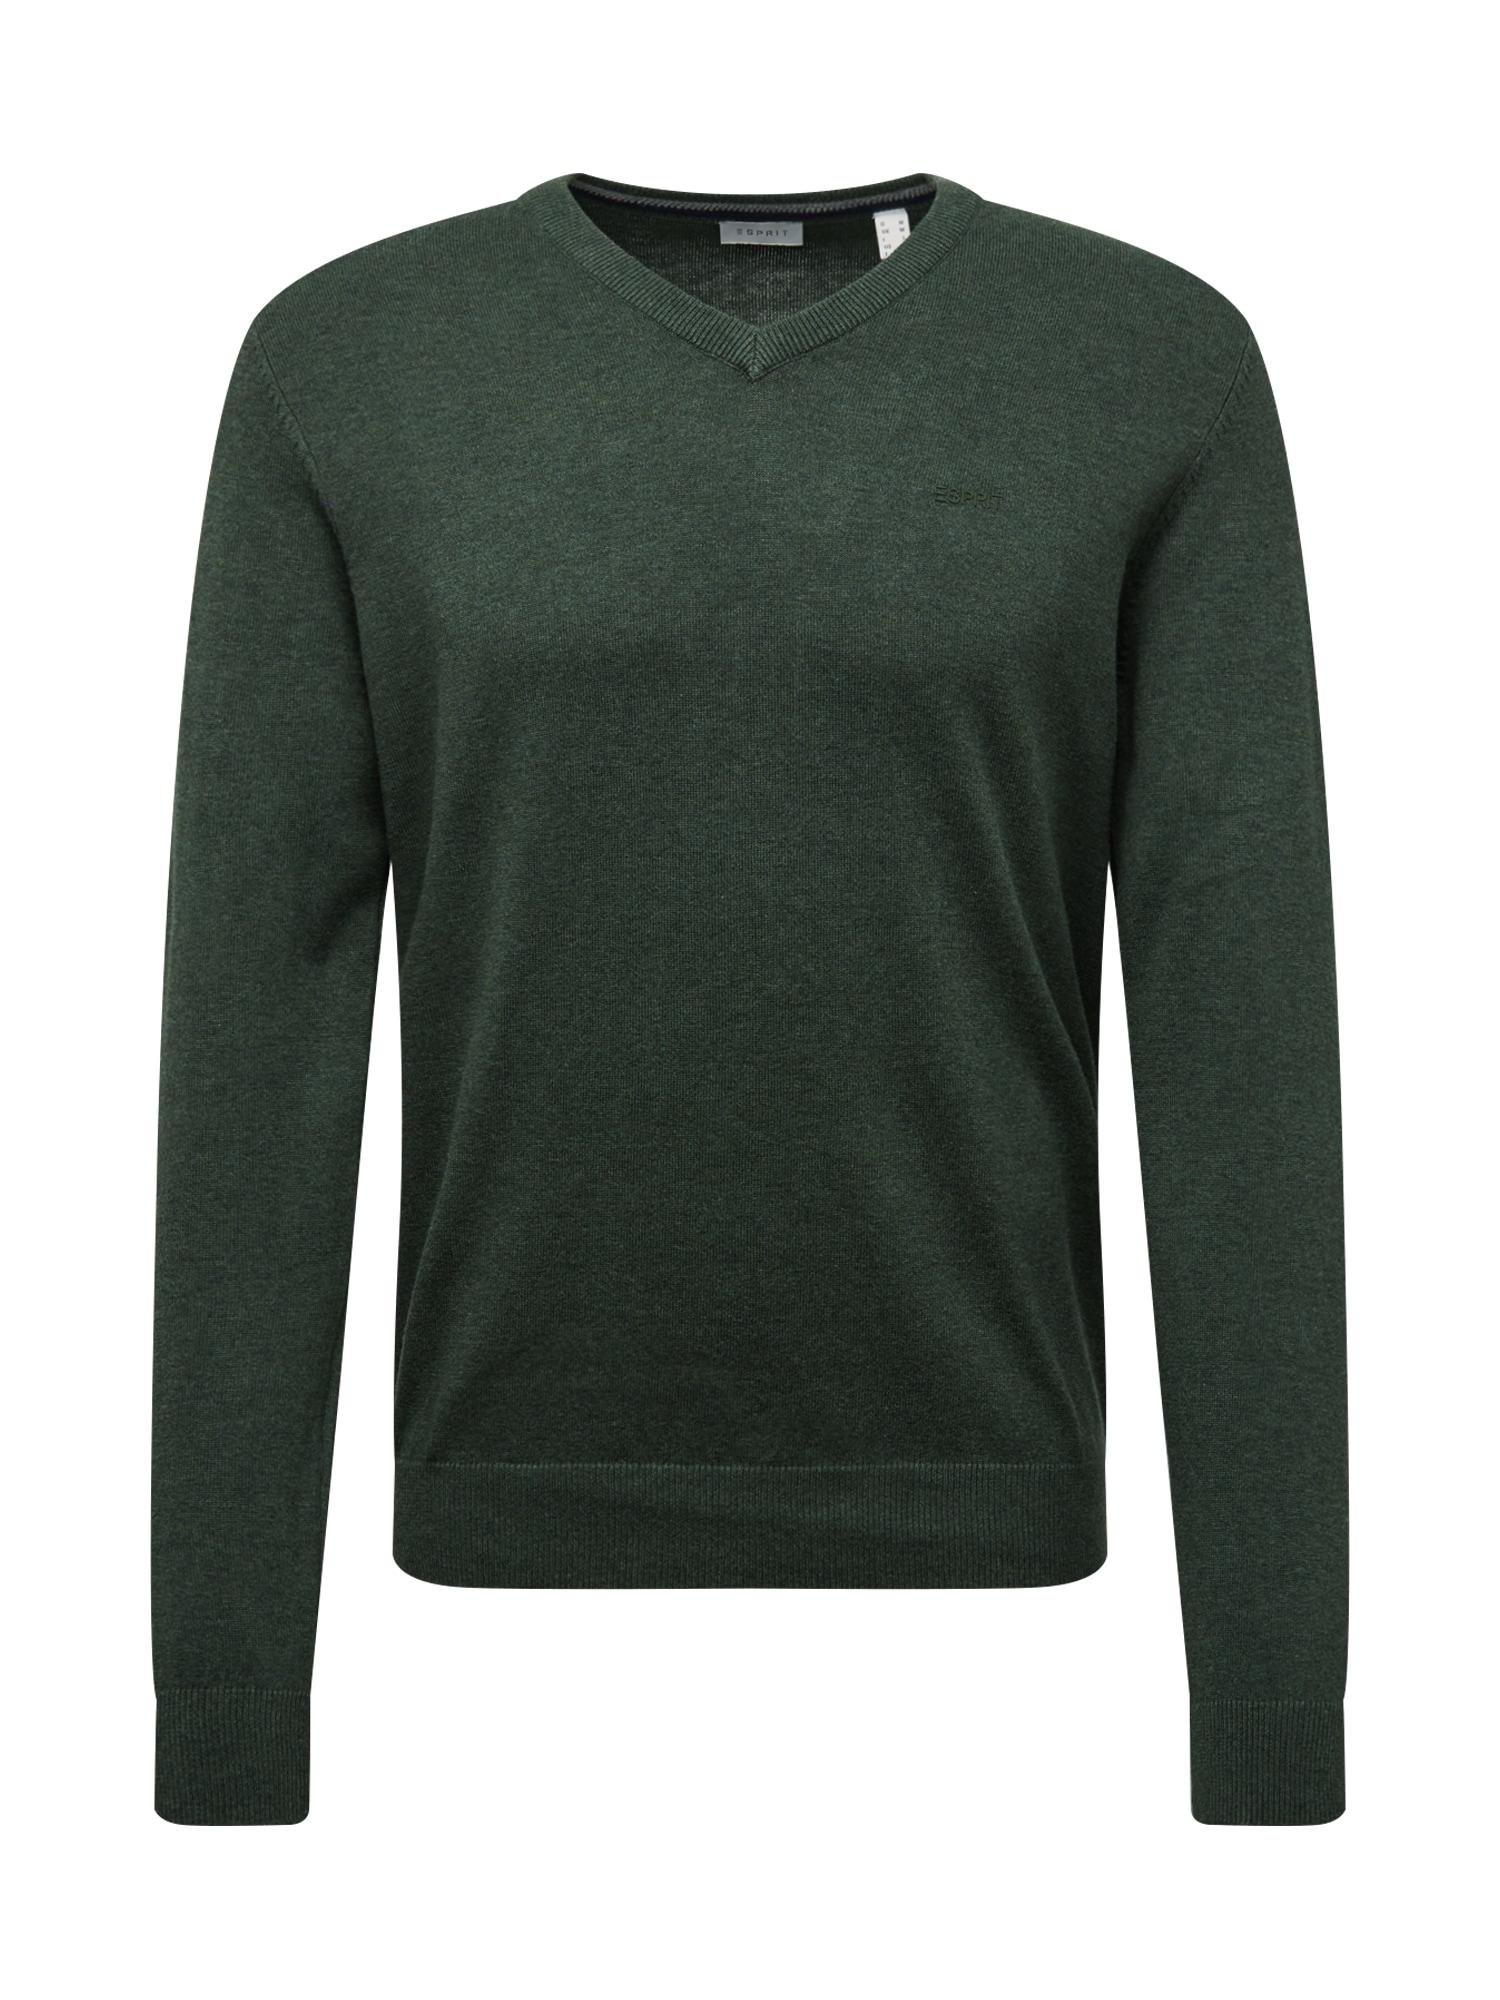 ESPRIT Megztinis žolės žalia